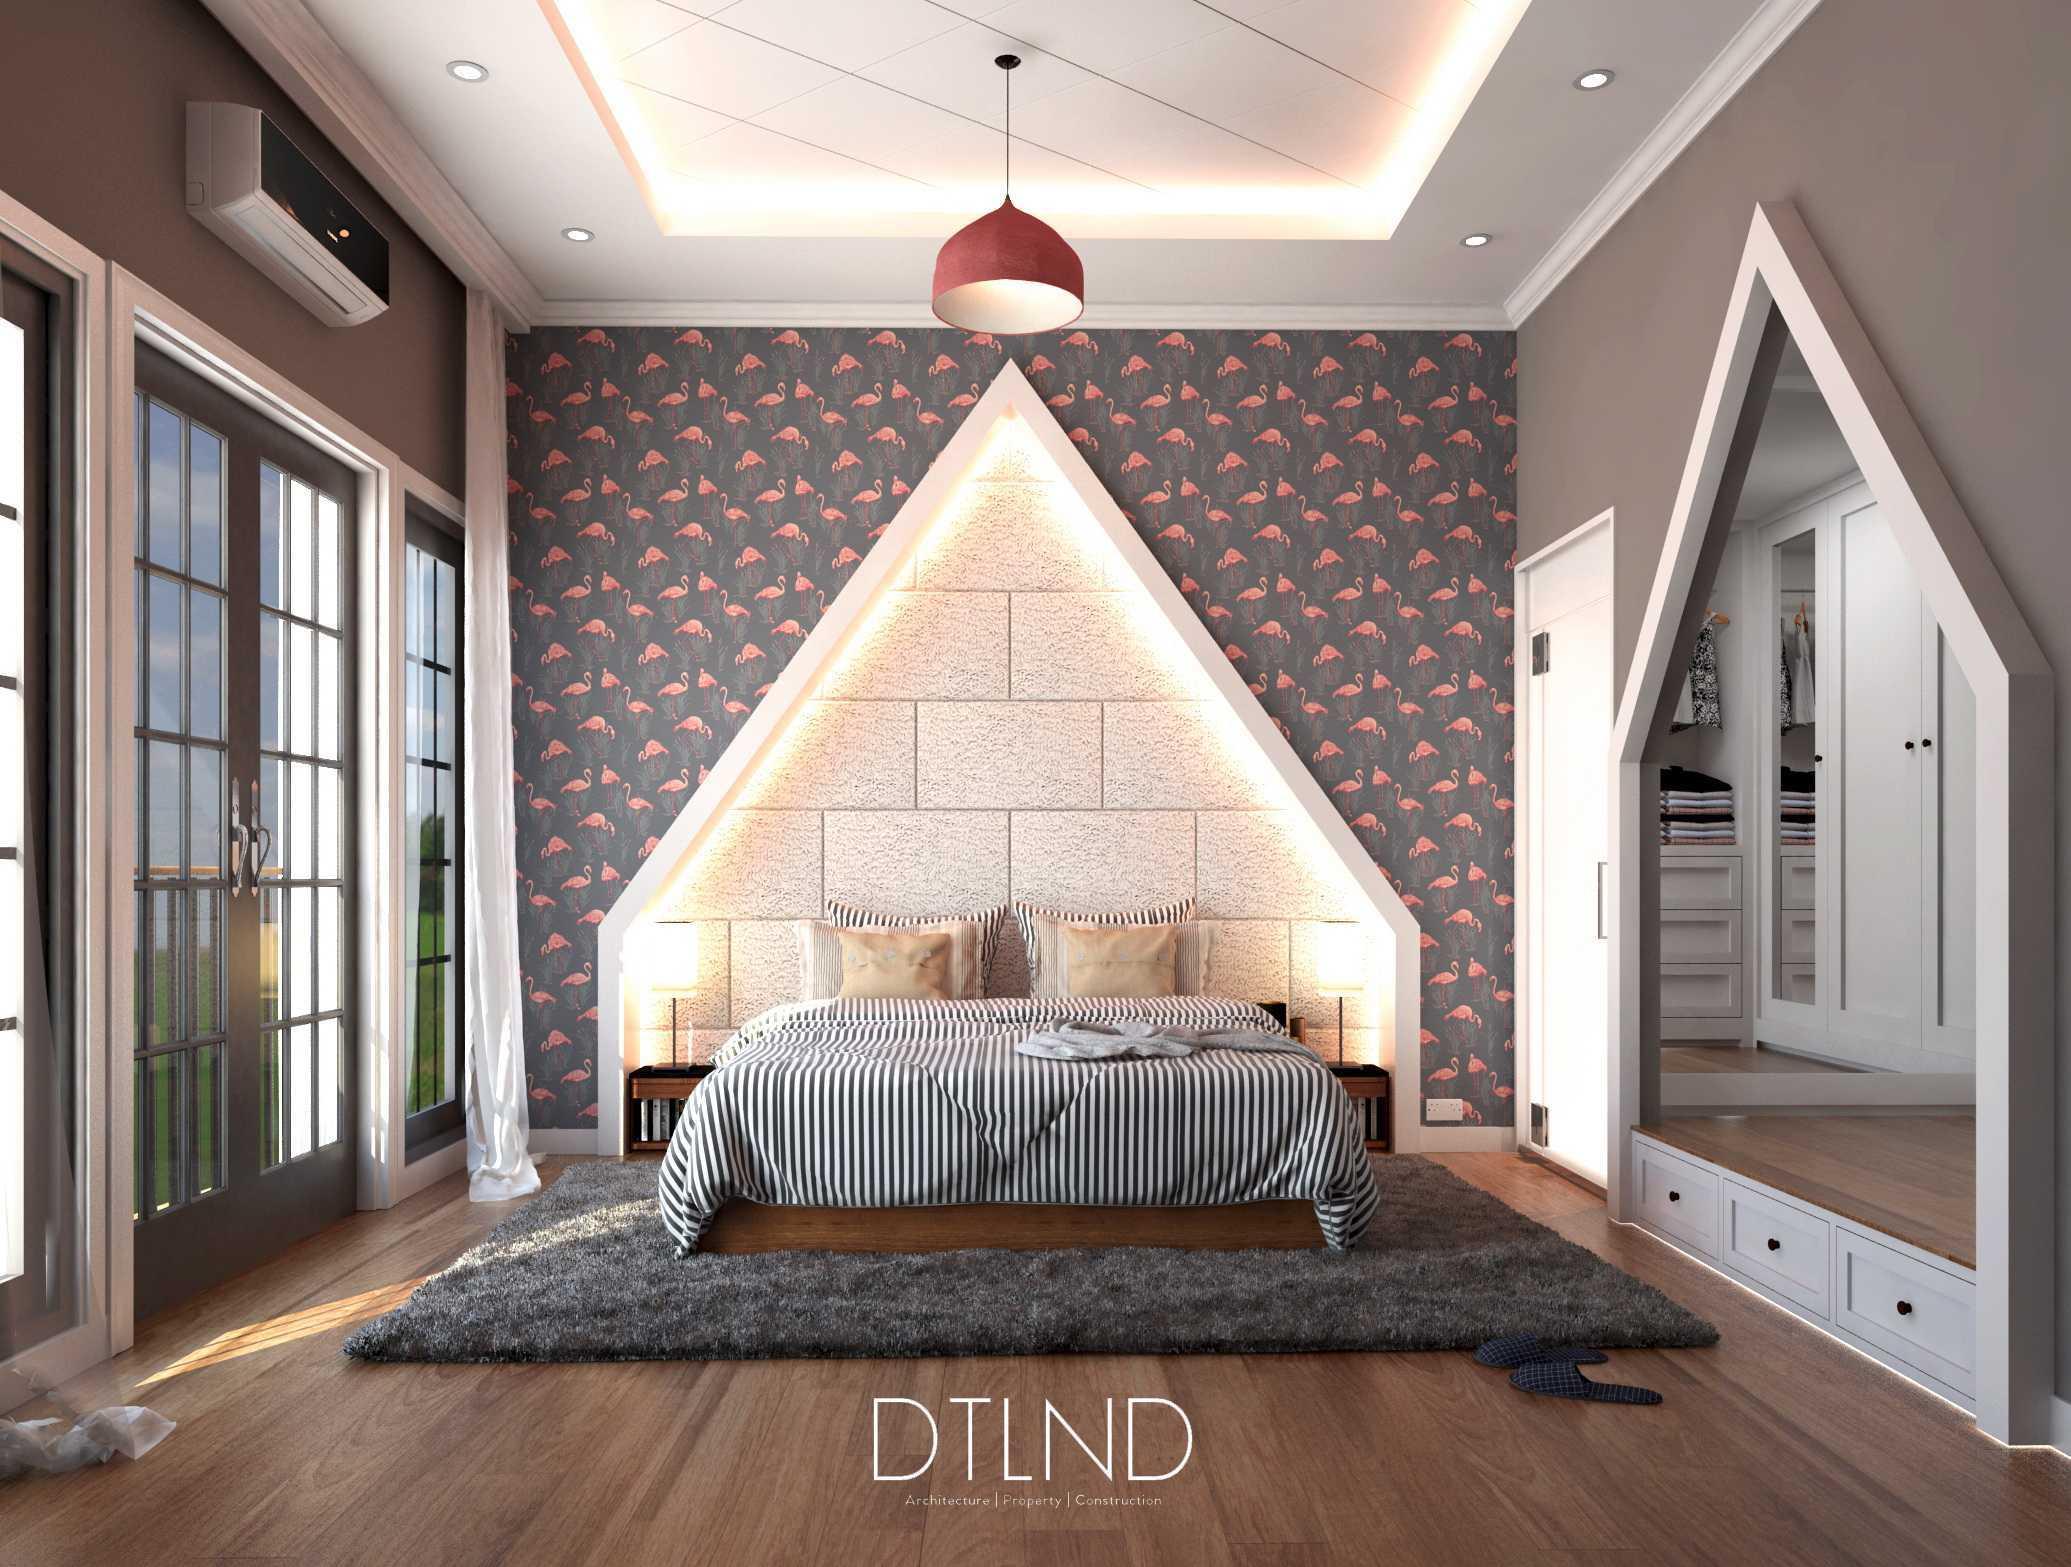 Dutaland House In Murni Medan, Kota Medan, Sumatera Utara, Indonesia Medan, Kota Medan, Sumatera Utara, Indonesia Girl's Bedroom   41111